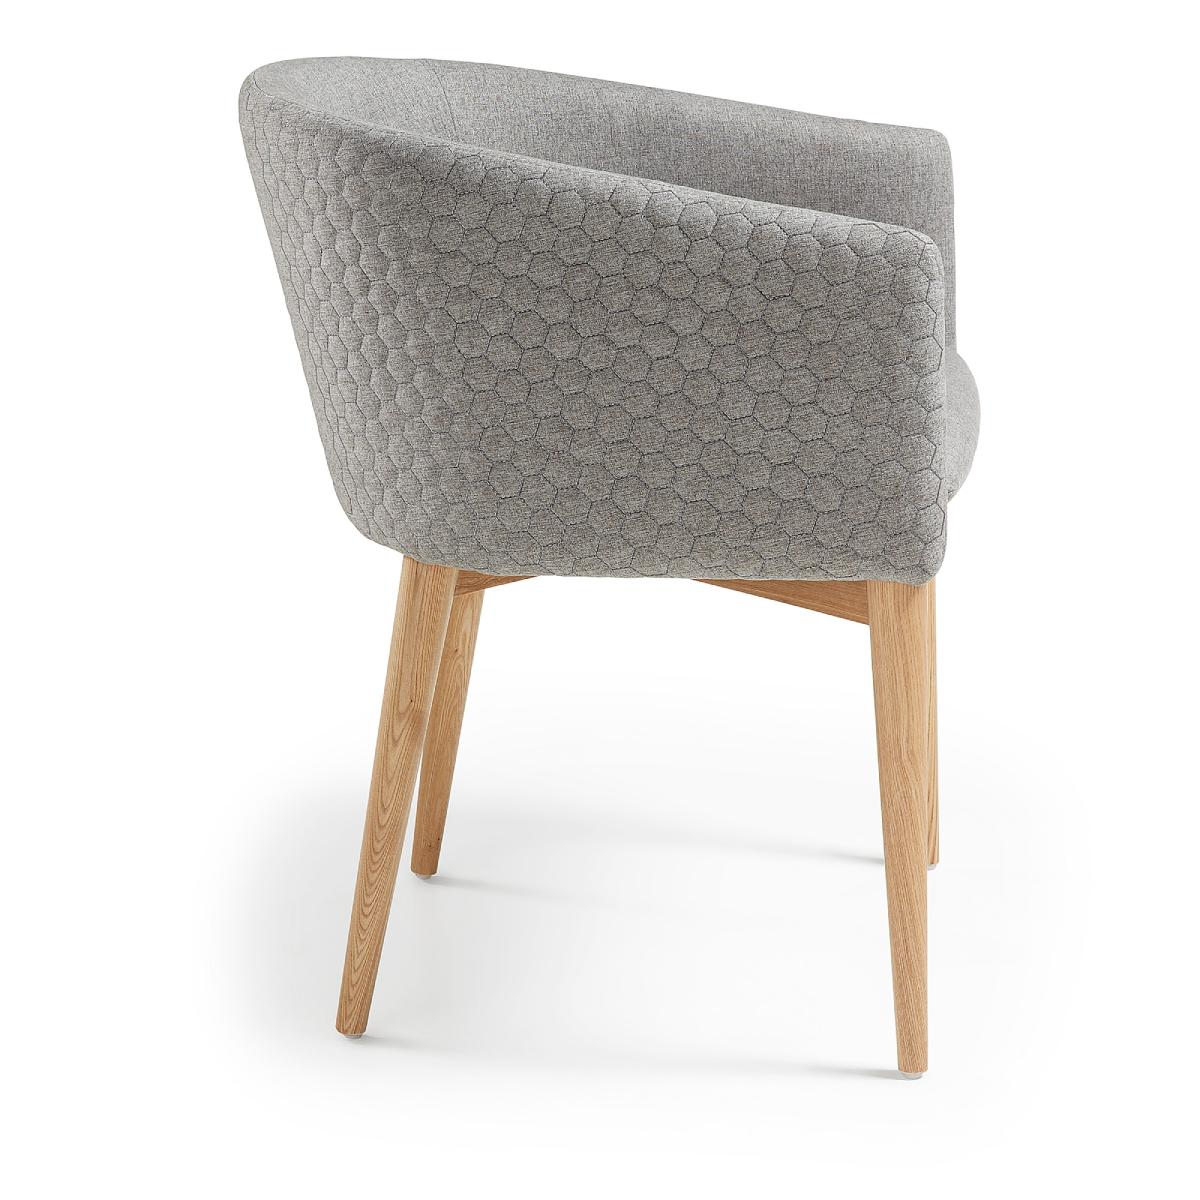 Jazzy vert chaise design geometrique achat vente for Achat chaise design